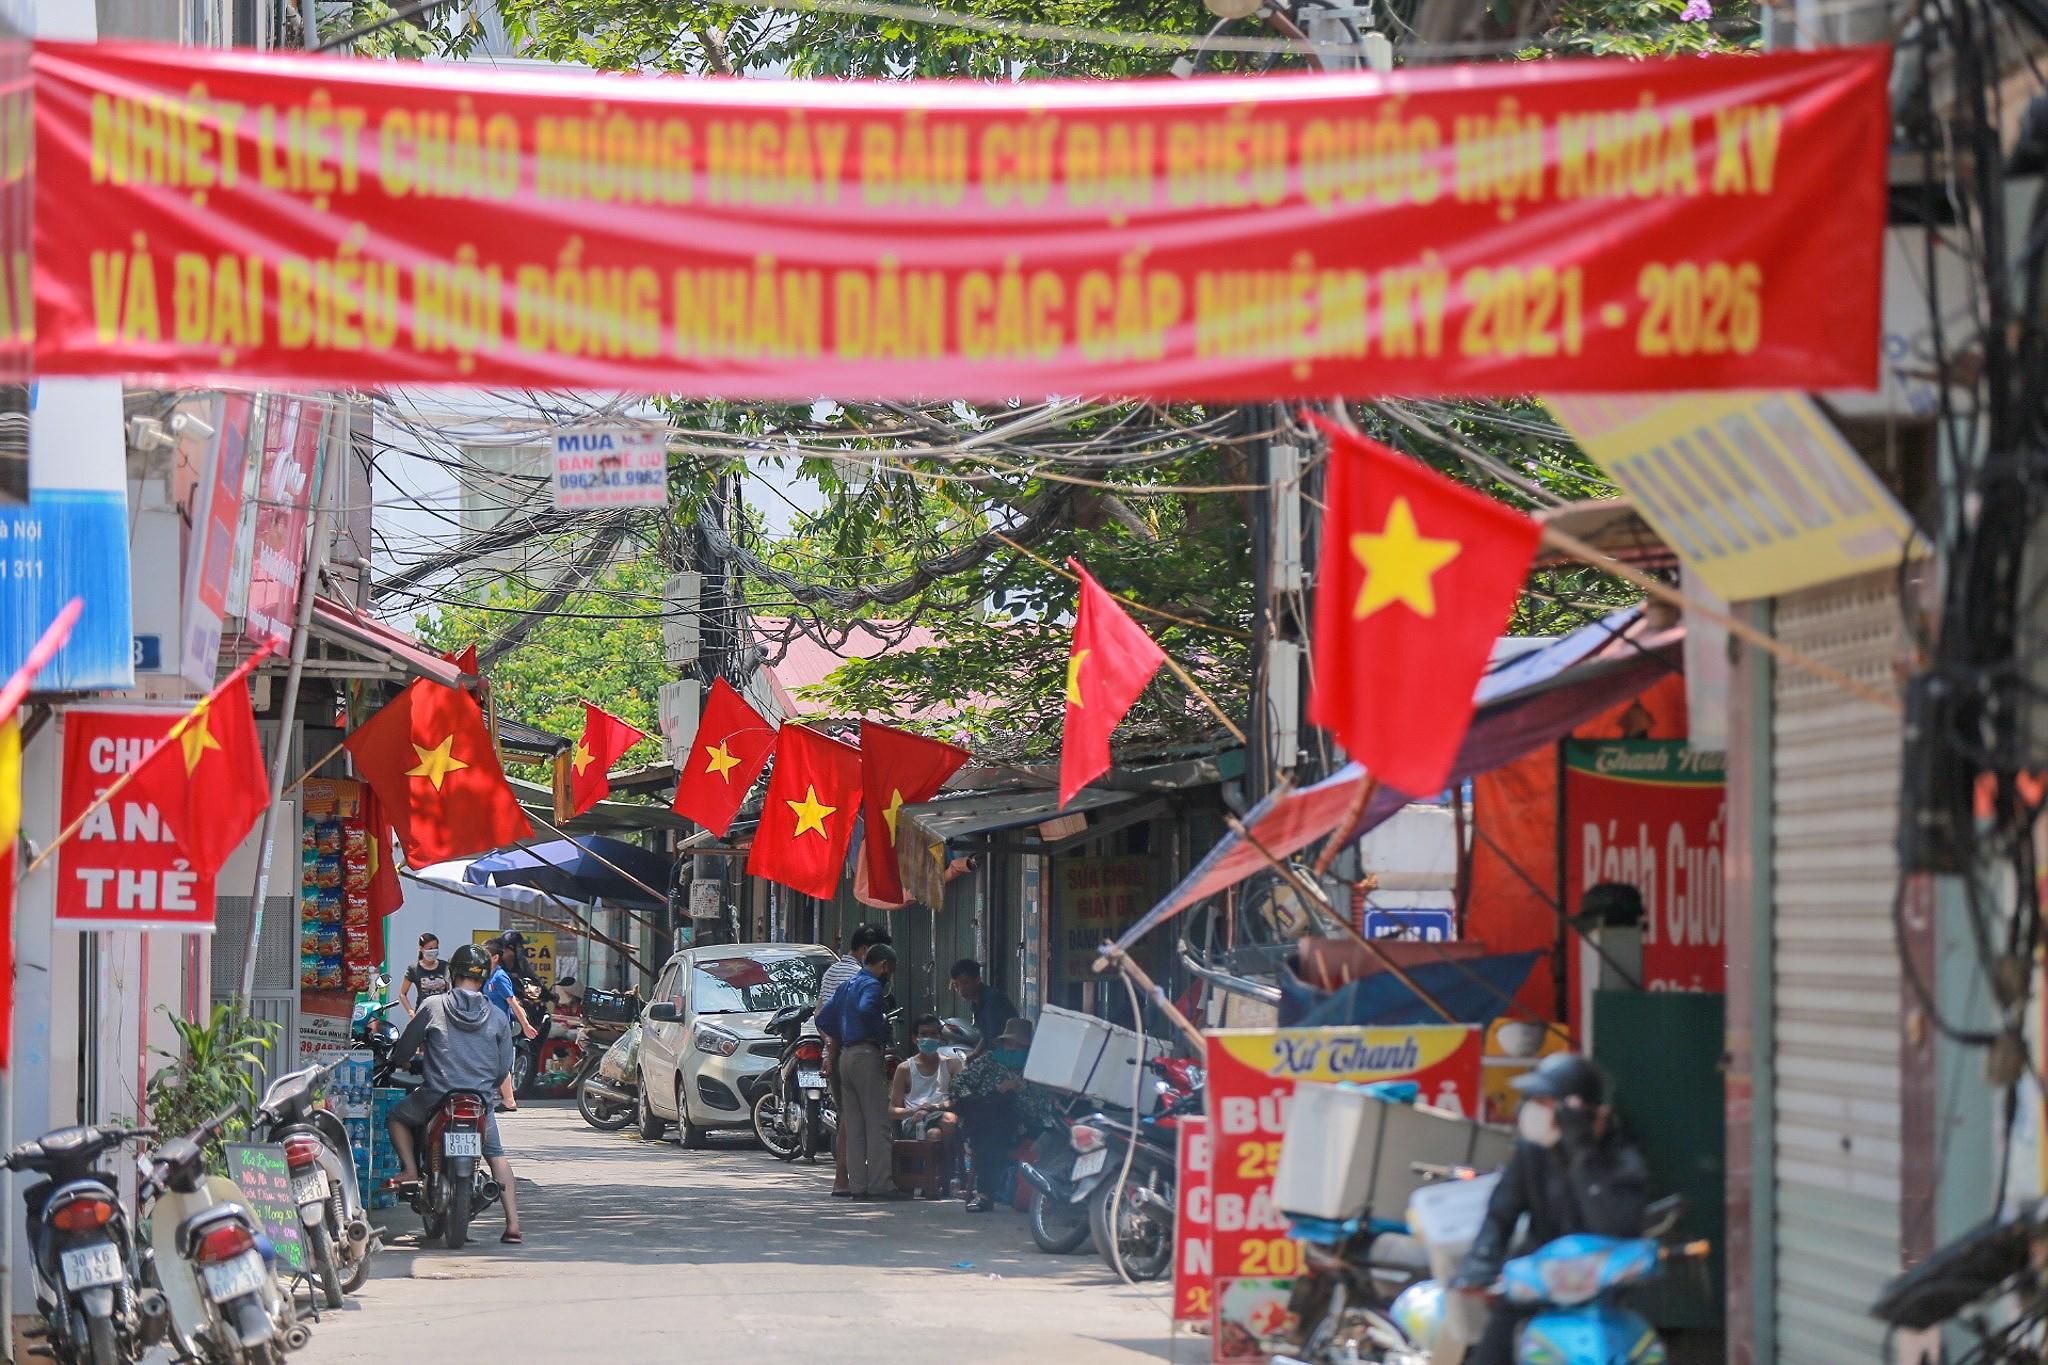 Pho phuong Ha Noi ruc ro co hoa chao don ngay hoi trong dai toan quoc hinh anh 19